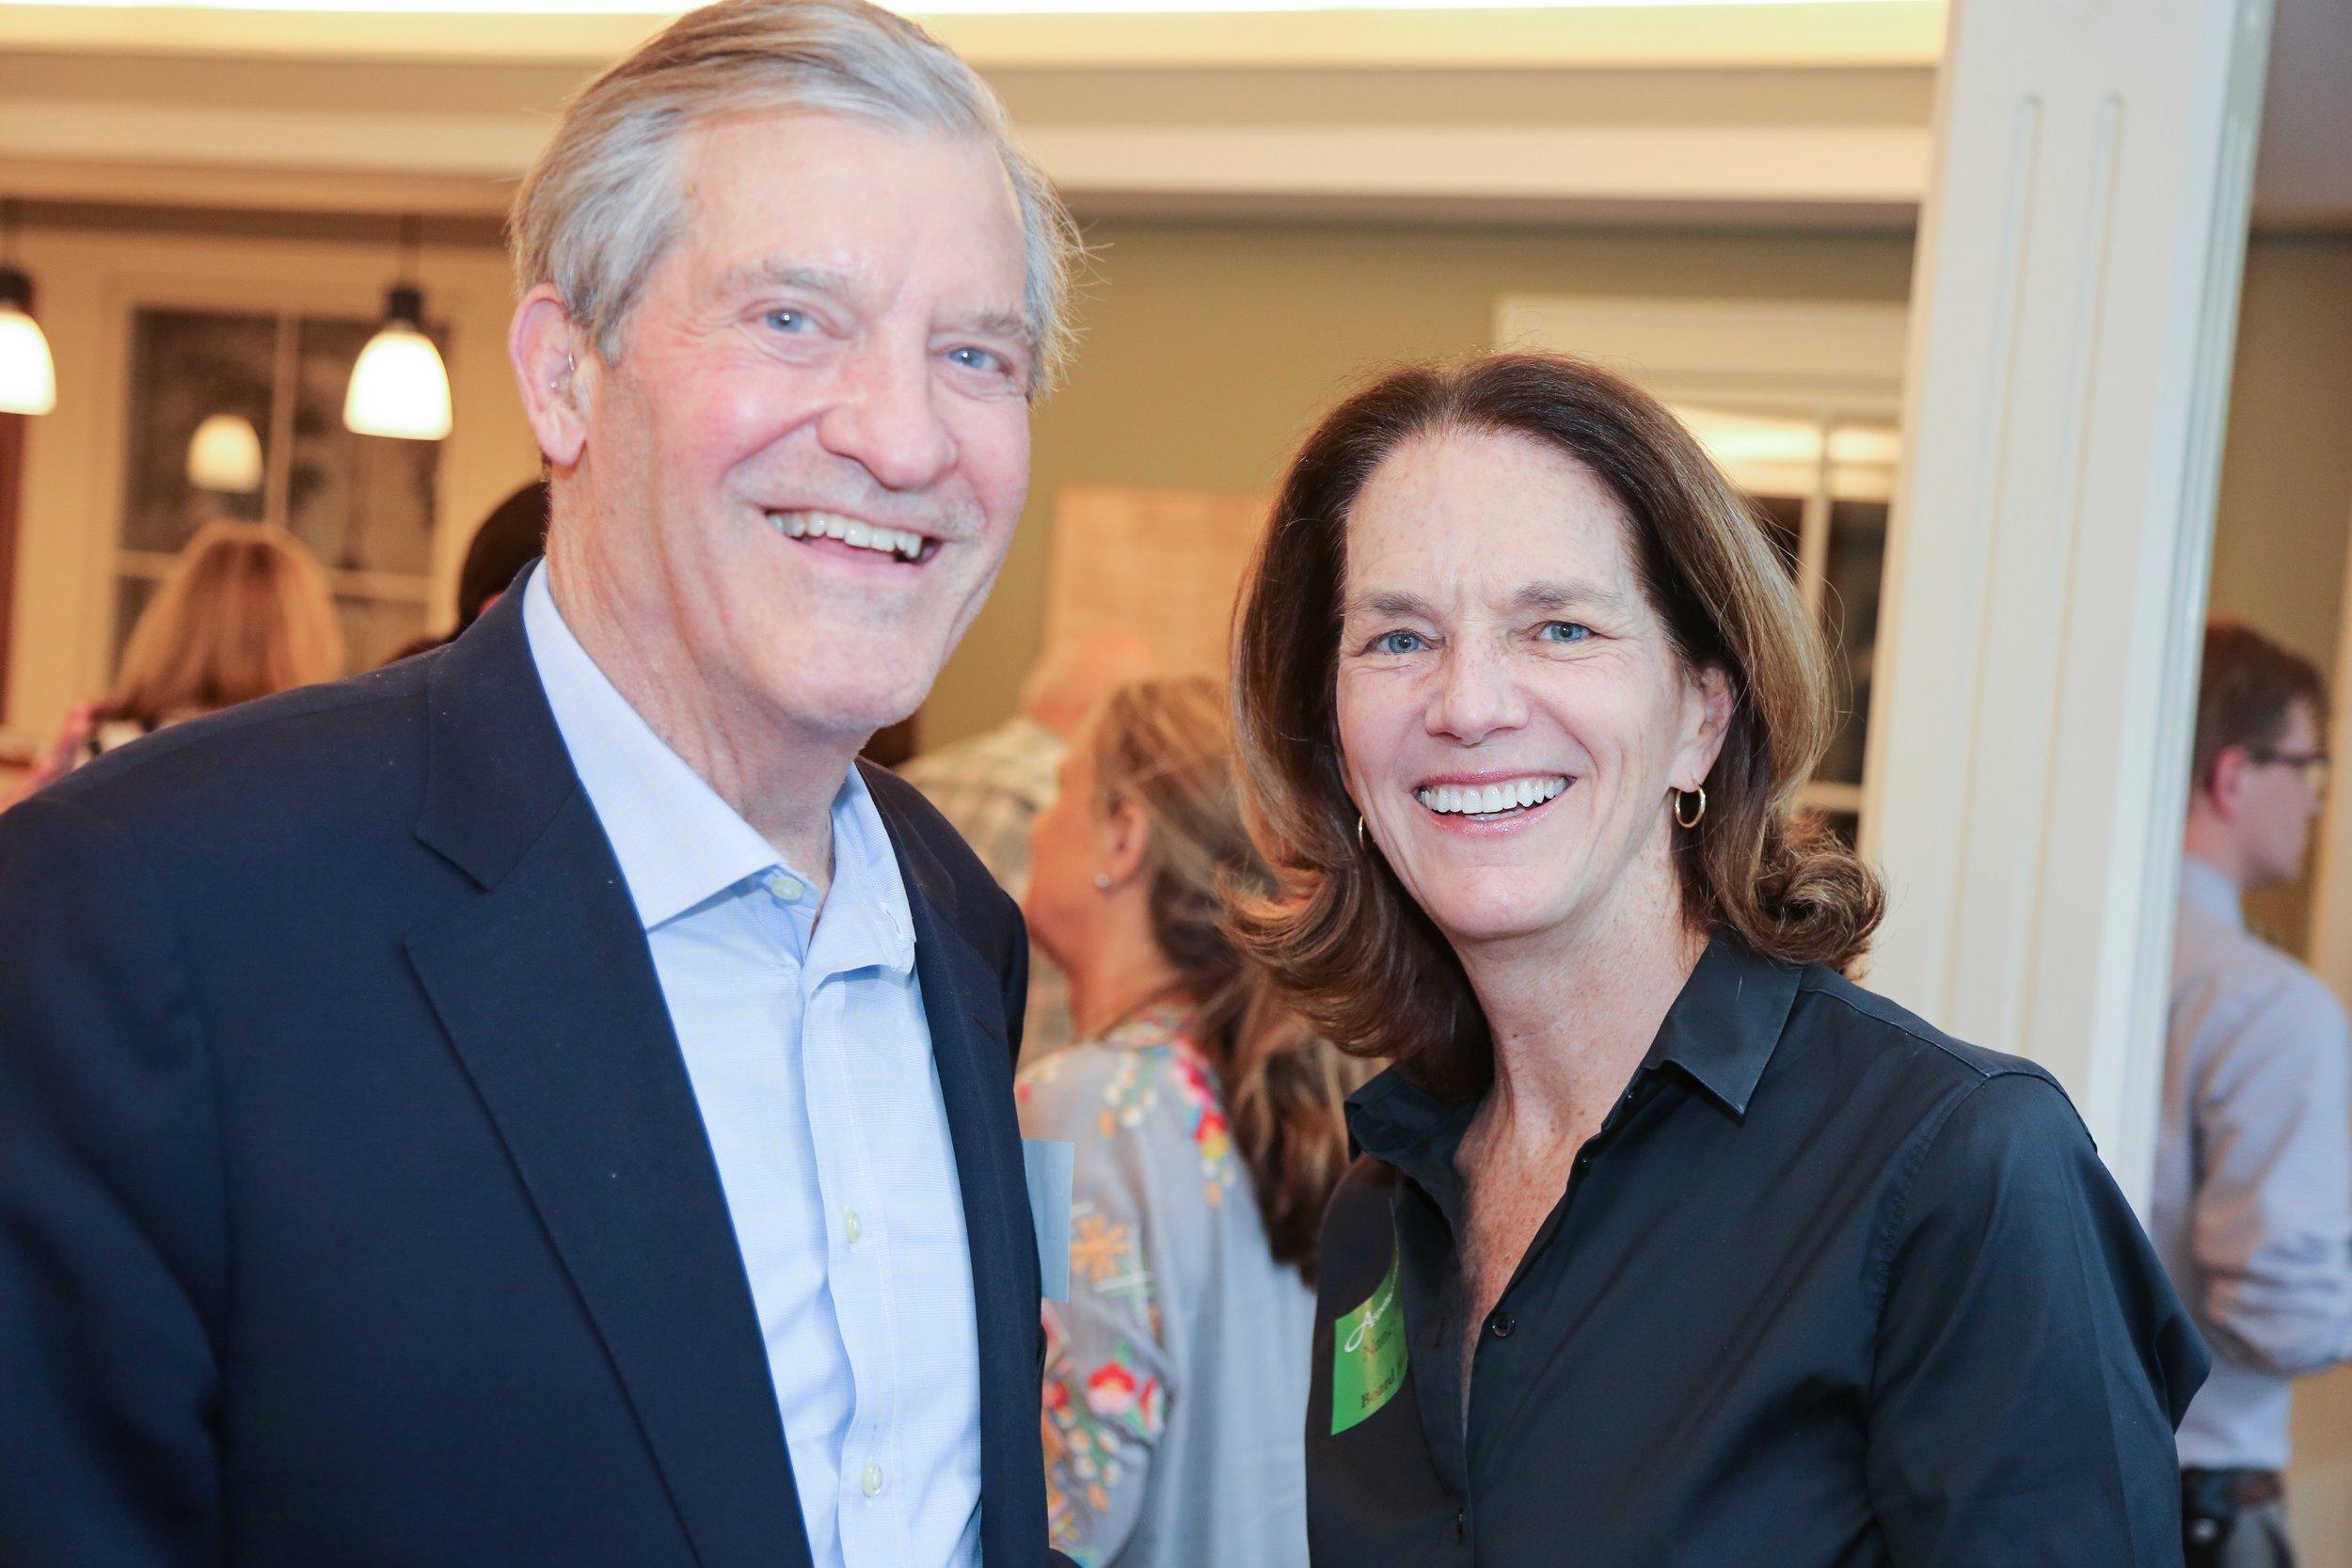 Aspetuck Land Trust member David Storrs with board member Nancy Moon.